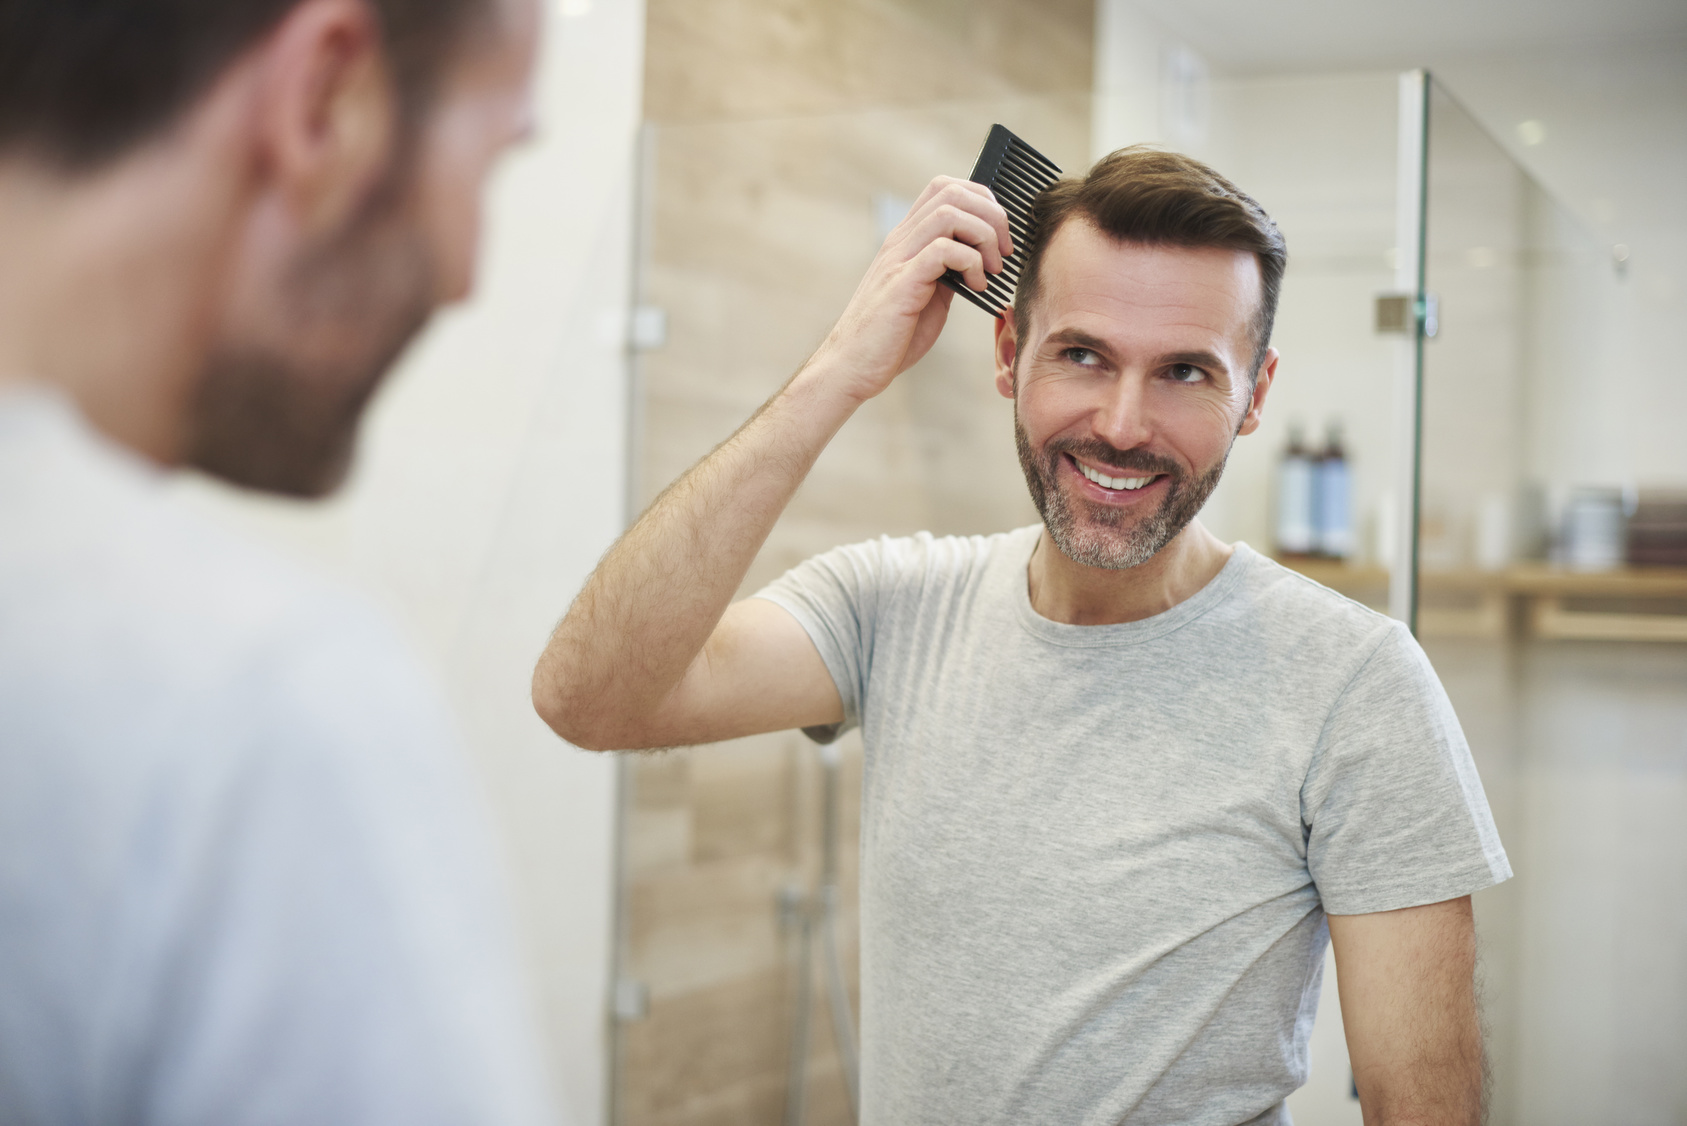 Frisuren Bei Haarausfall Fur Manner Und Frauen Haarzentrum An Der Oper